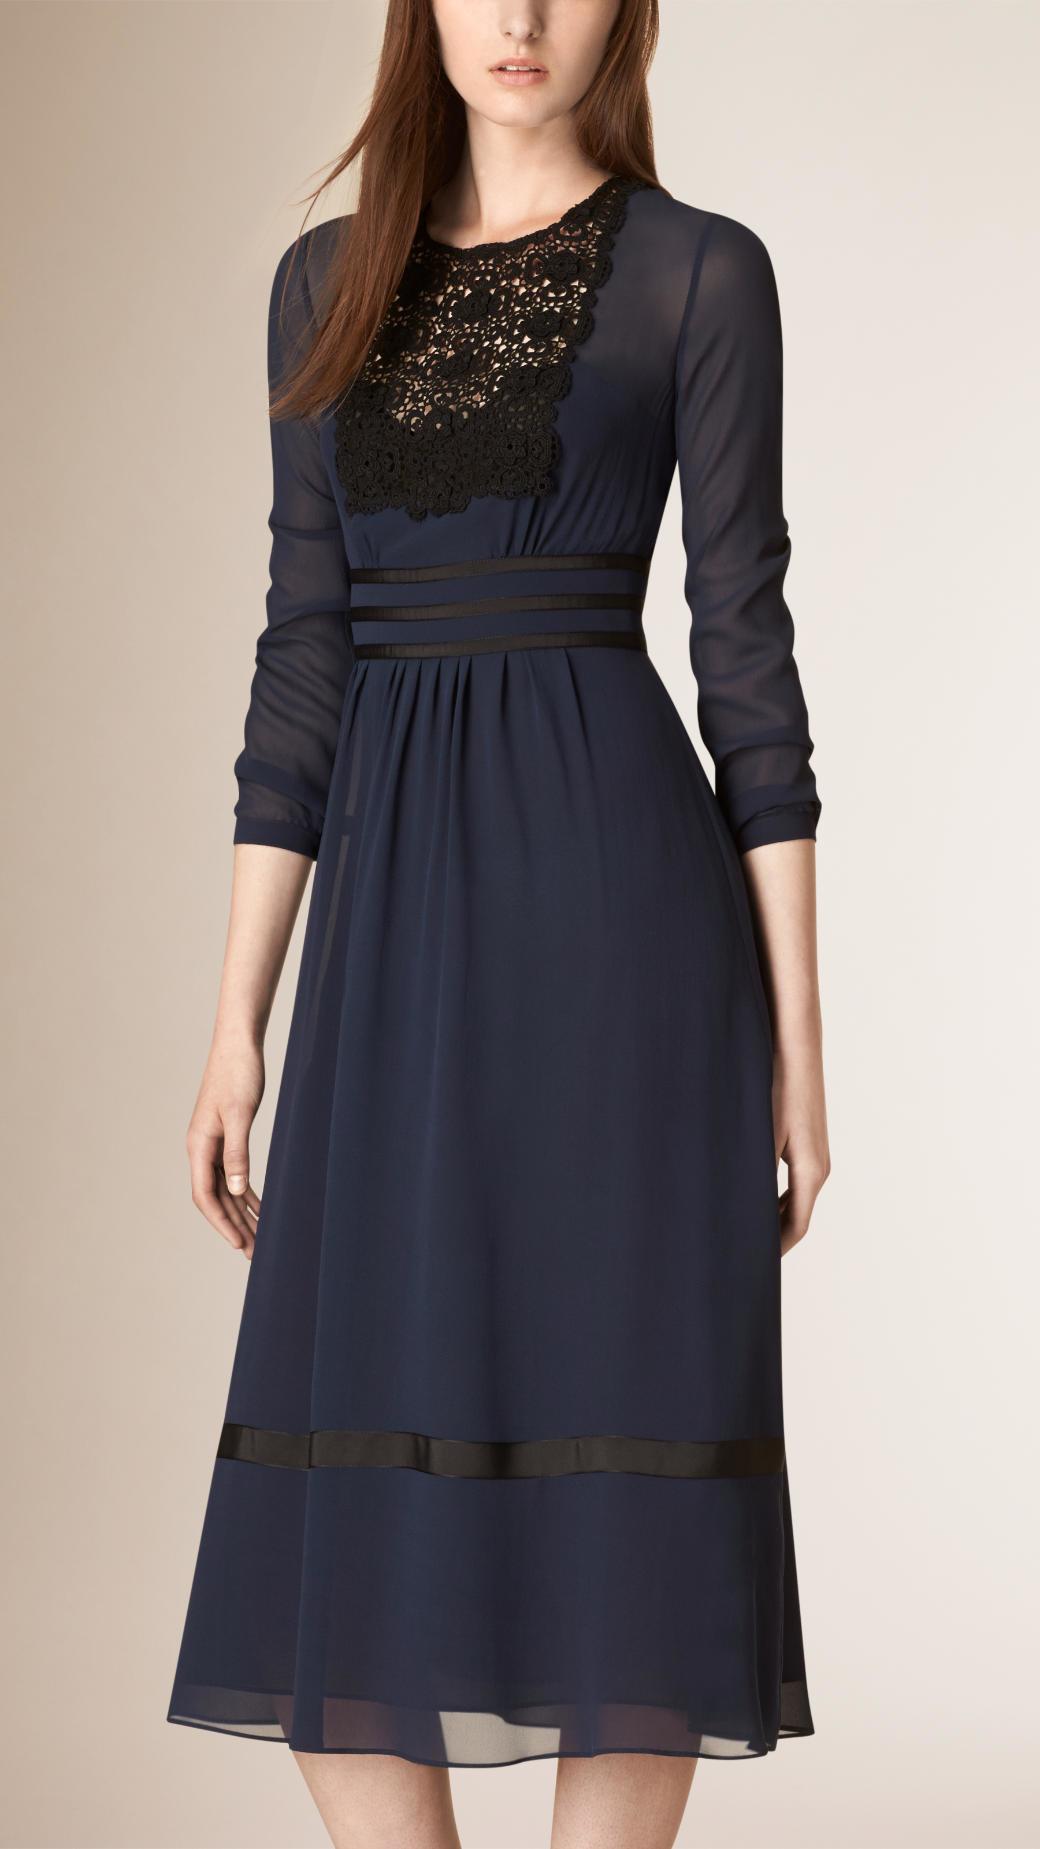 Burberry Lace Trim Sil... Victoria Beckham Clothing